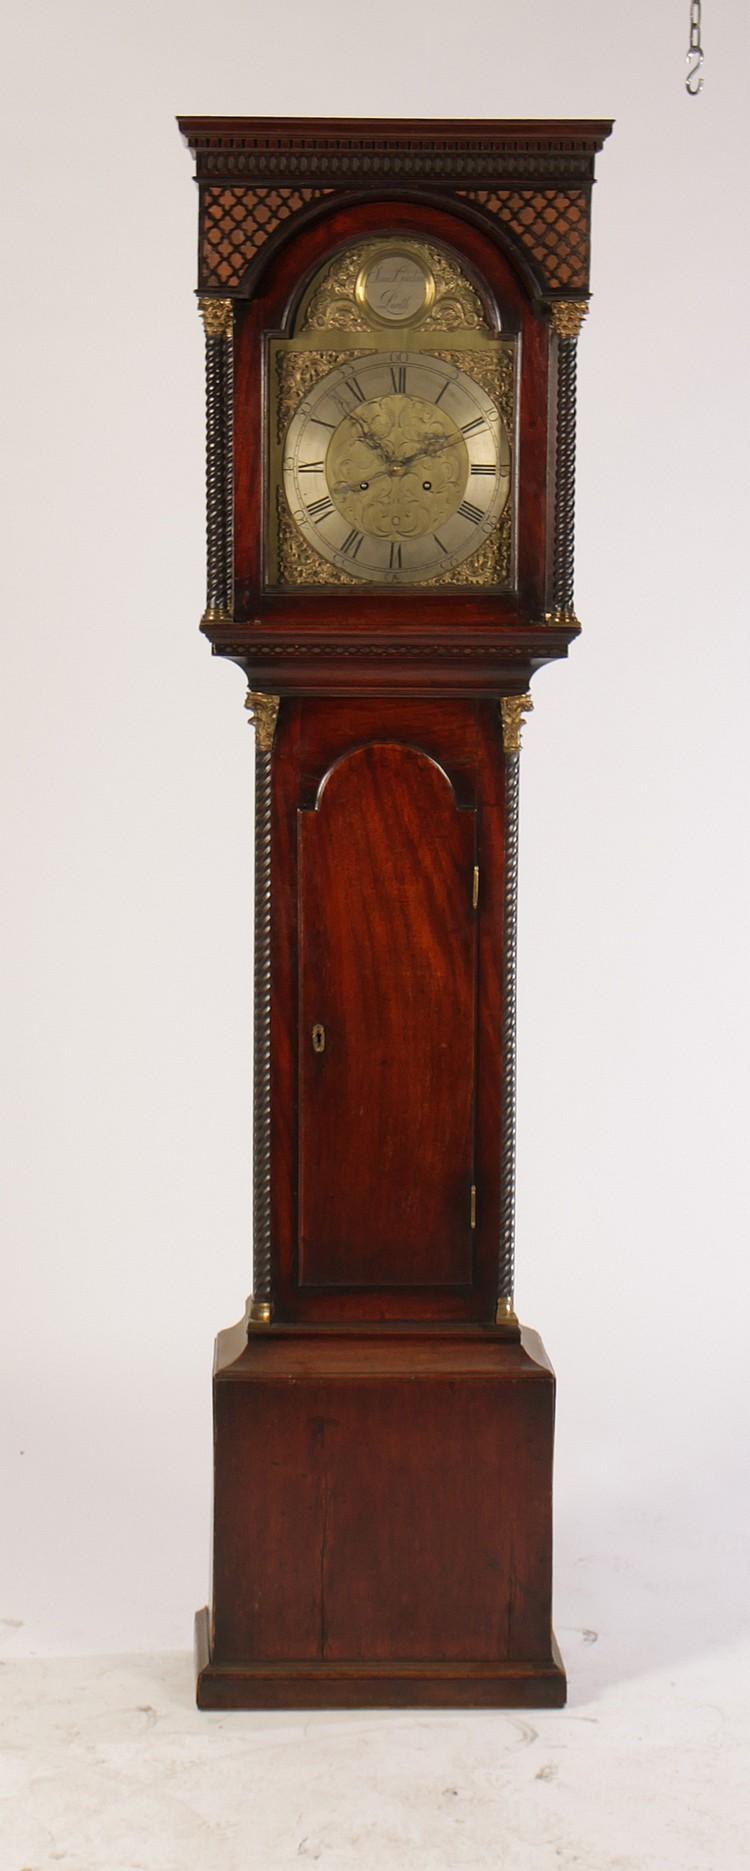 James gordon perth tall case clock circa 1880 for Asian antiques perth